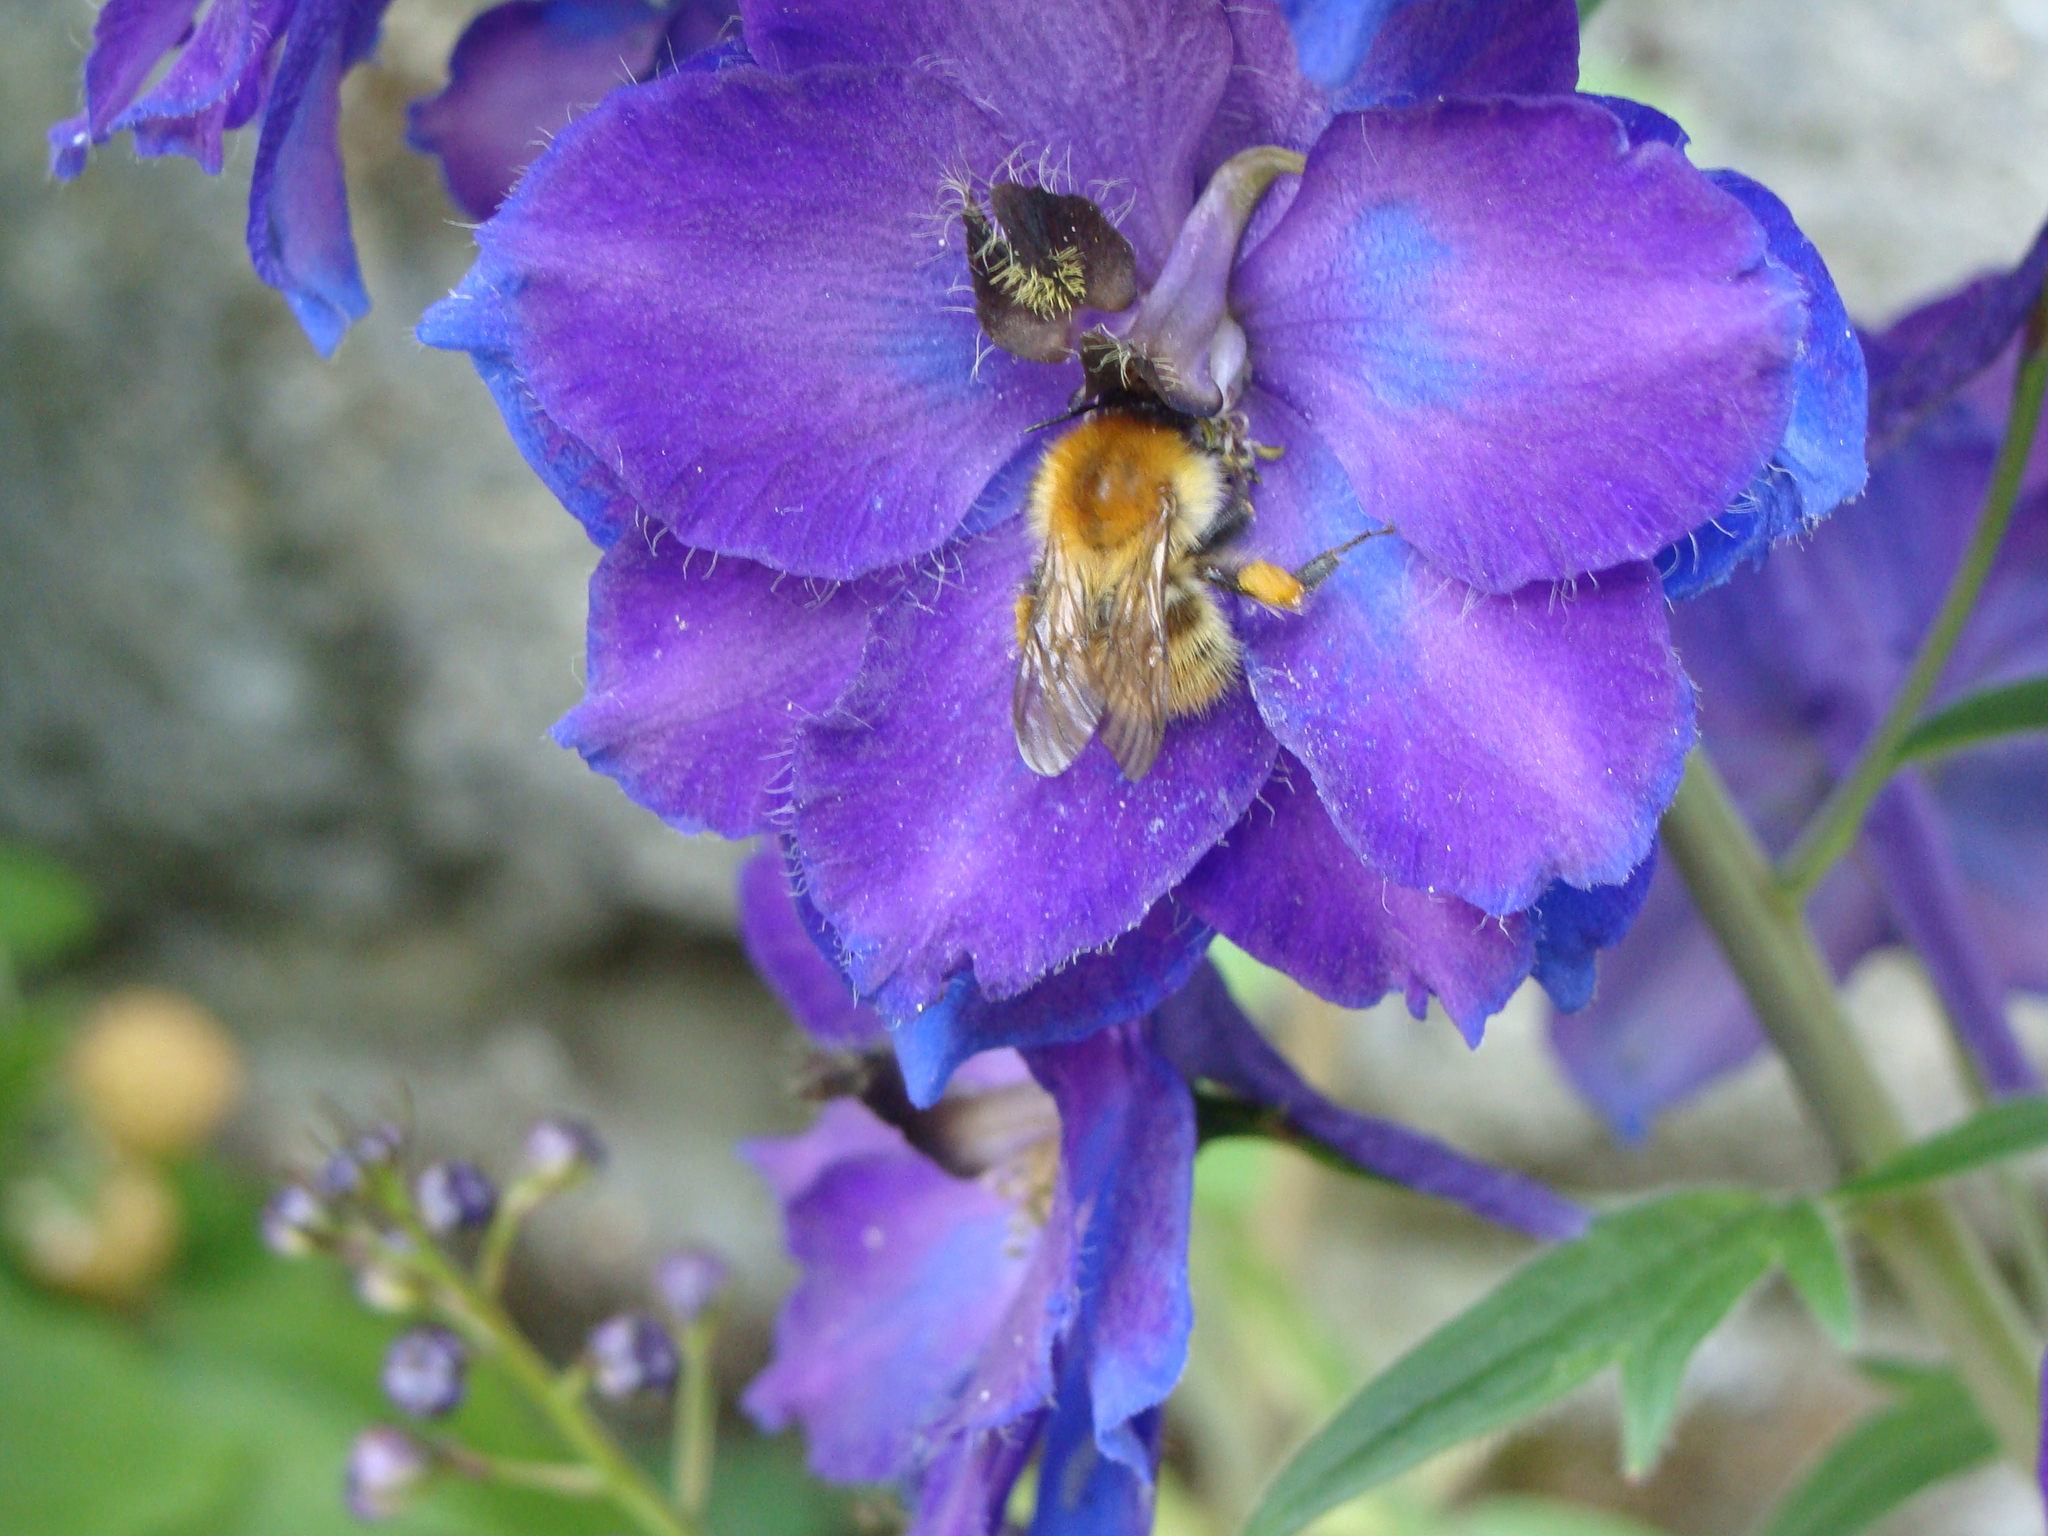 Insecte pollinisateur LDDM